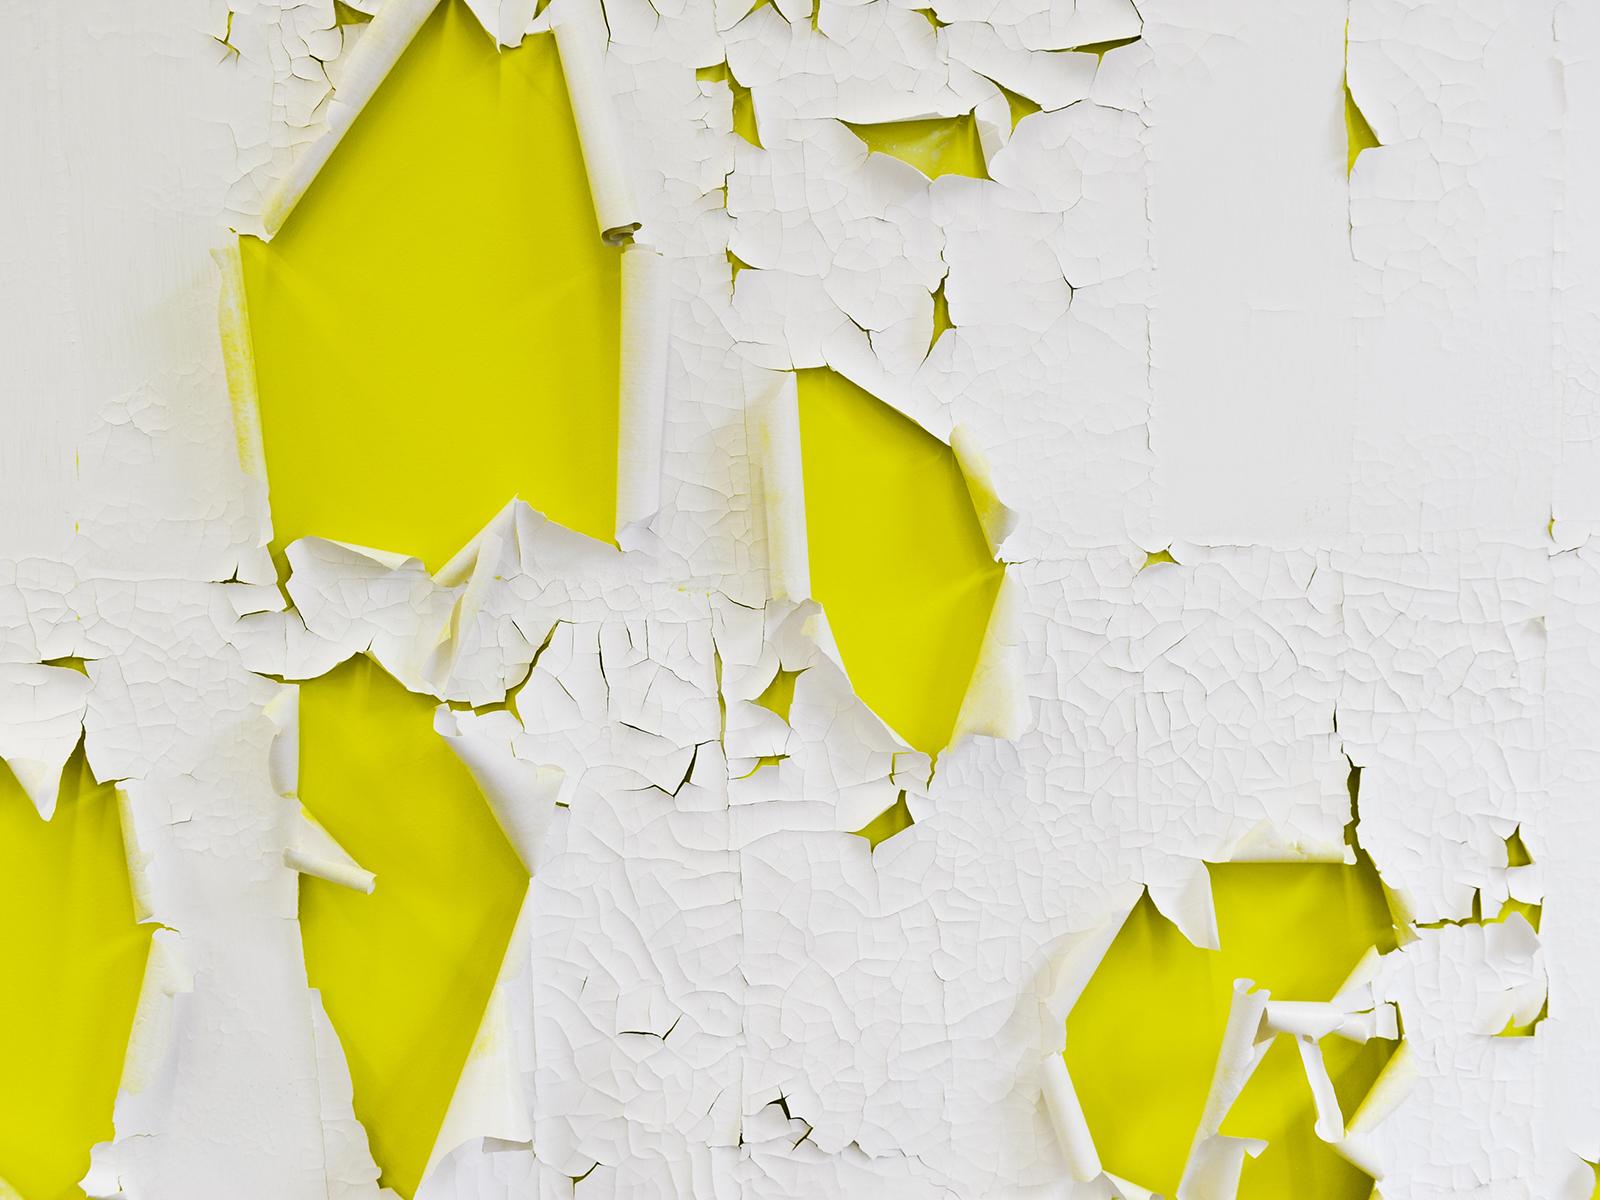 Benoit-Delaunay-artiste-installations-Un Sentiment de Chaleur-14